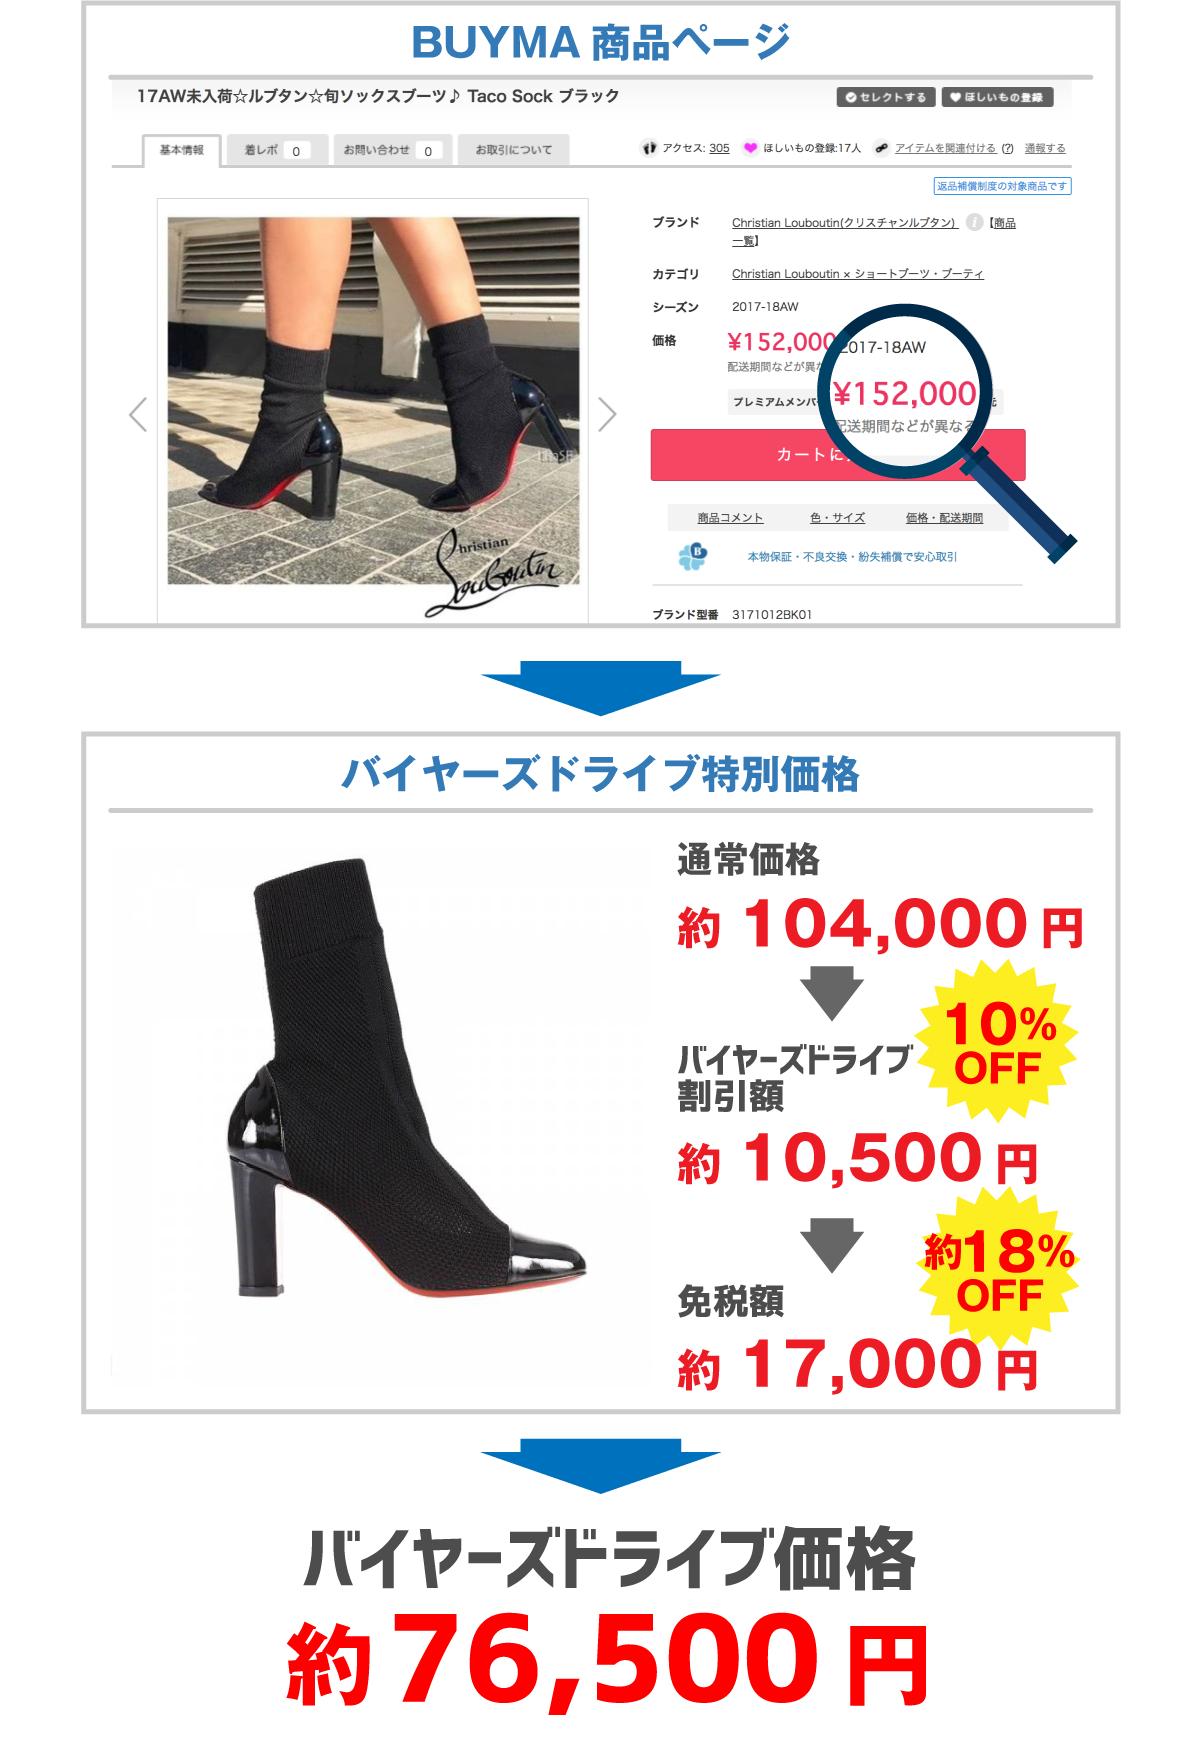 【CHRISTIAN LOUBOUTIN】Taco sock ブーツ